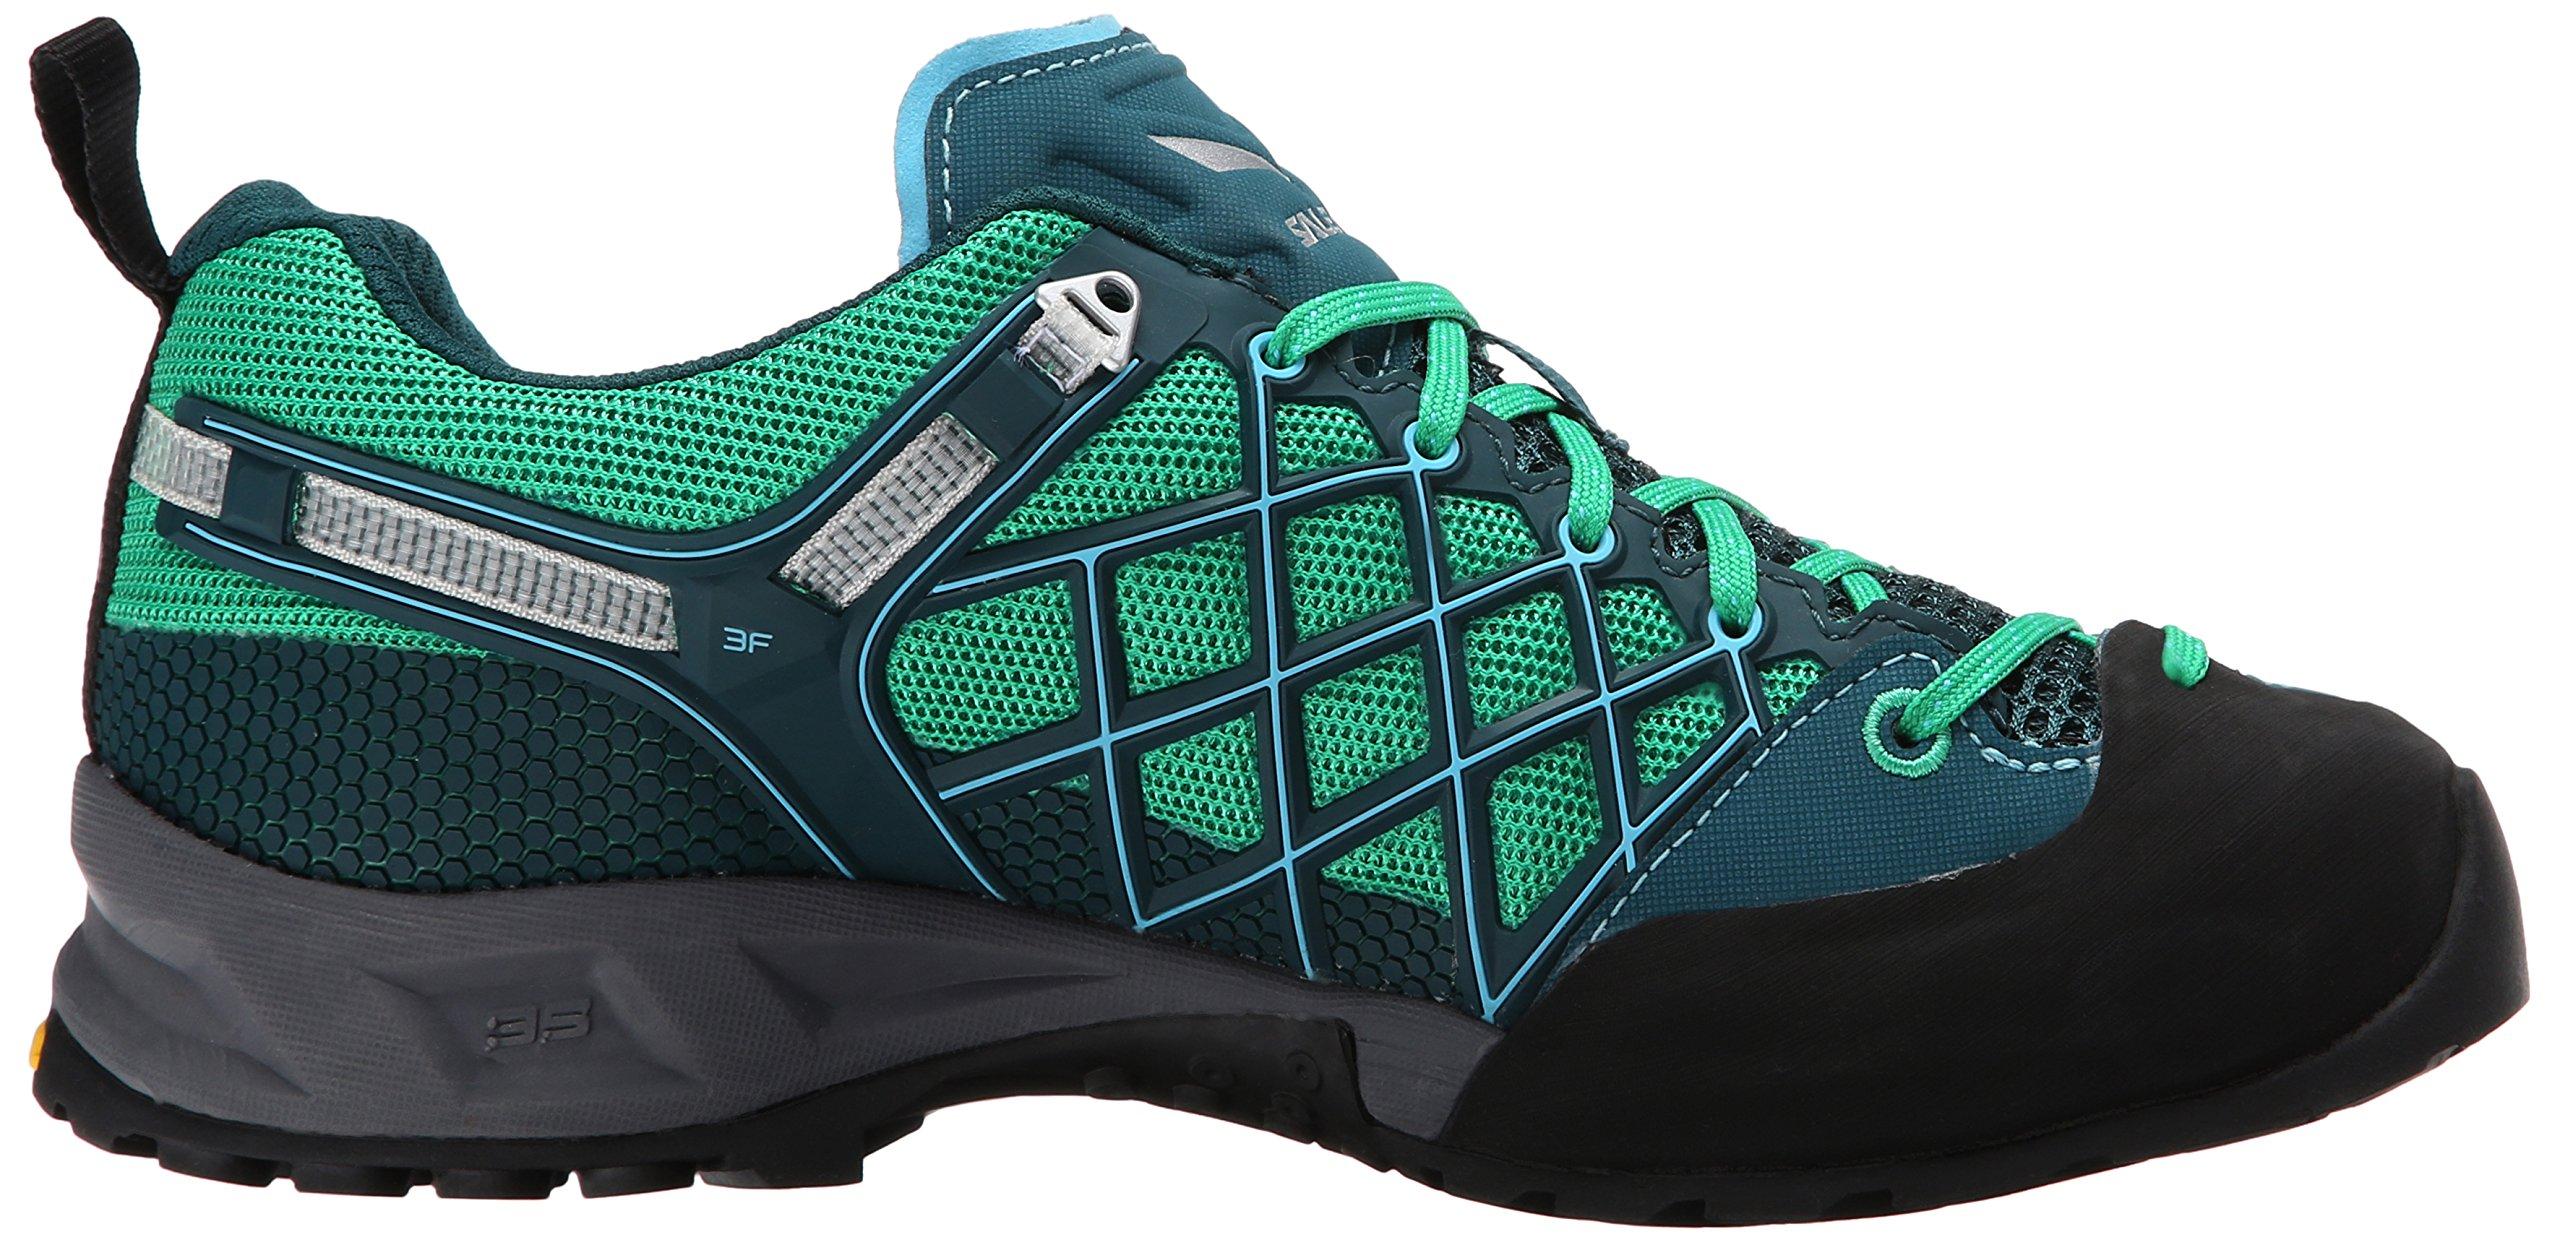 Salewa Women's Wildfire S GTX Technical Approach Shoe, Cypress/River Blue, 6.5 M US by Salewa (Image #6)